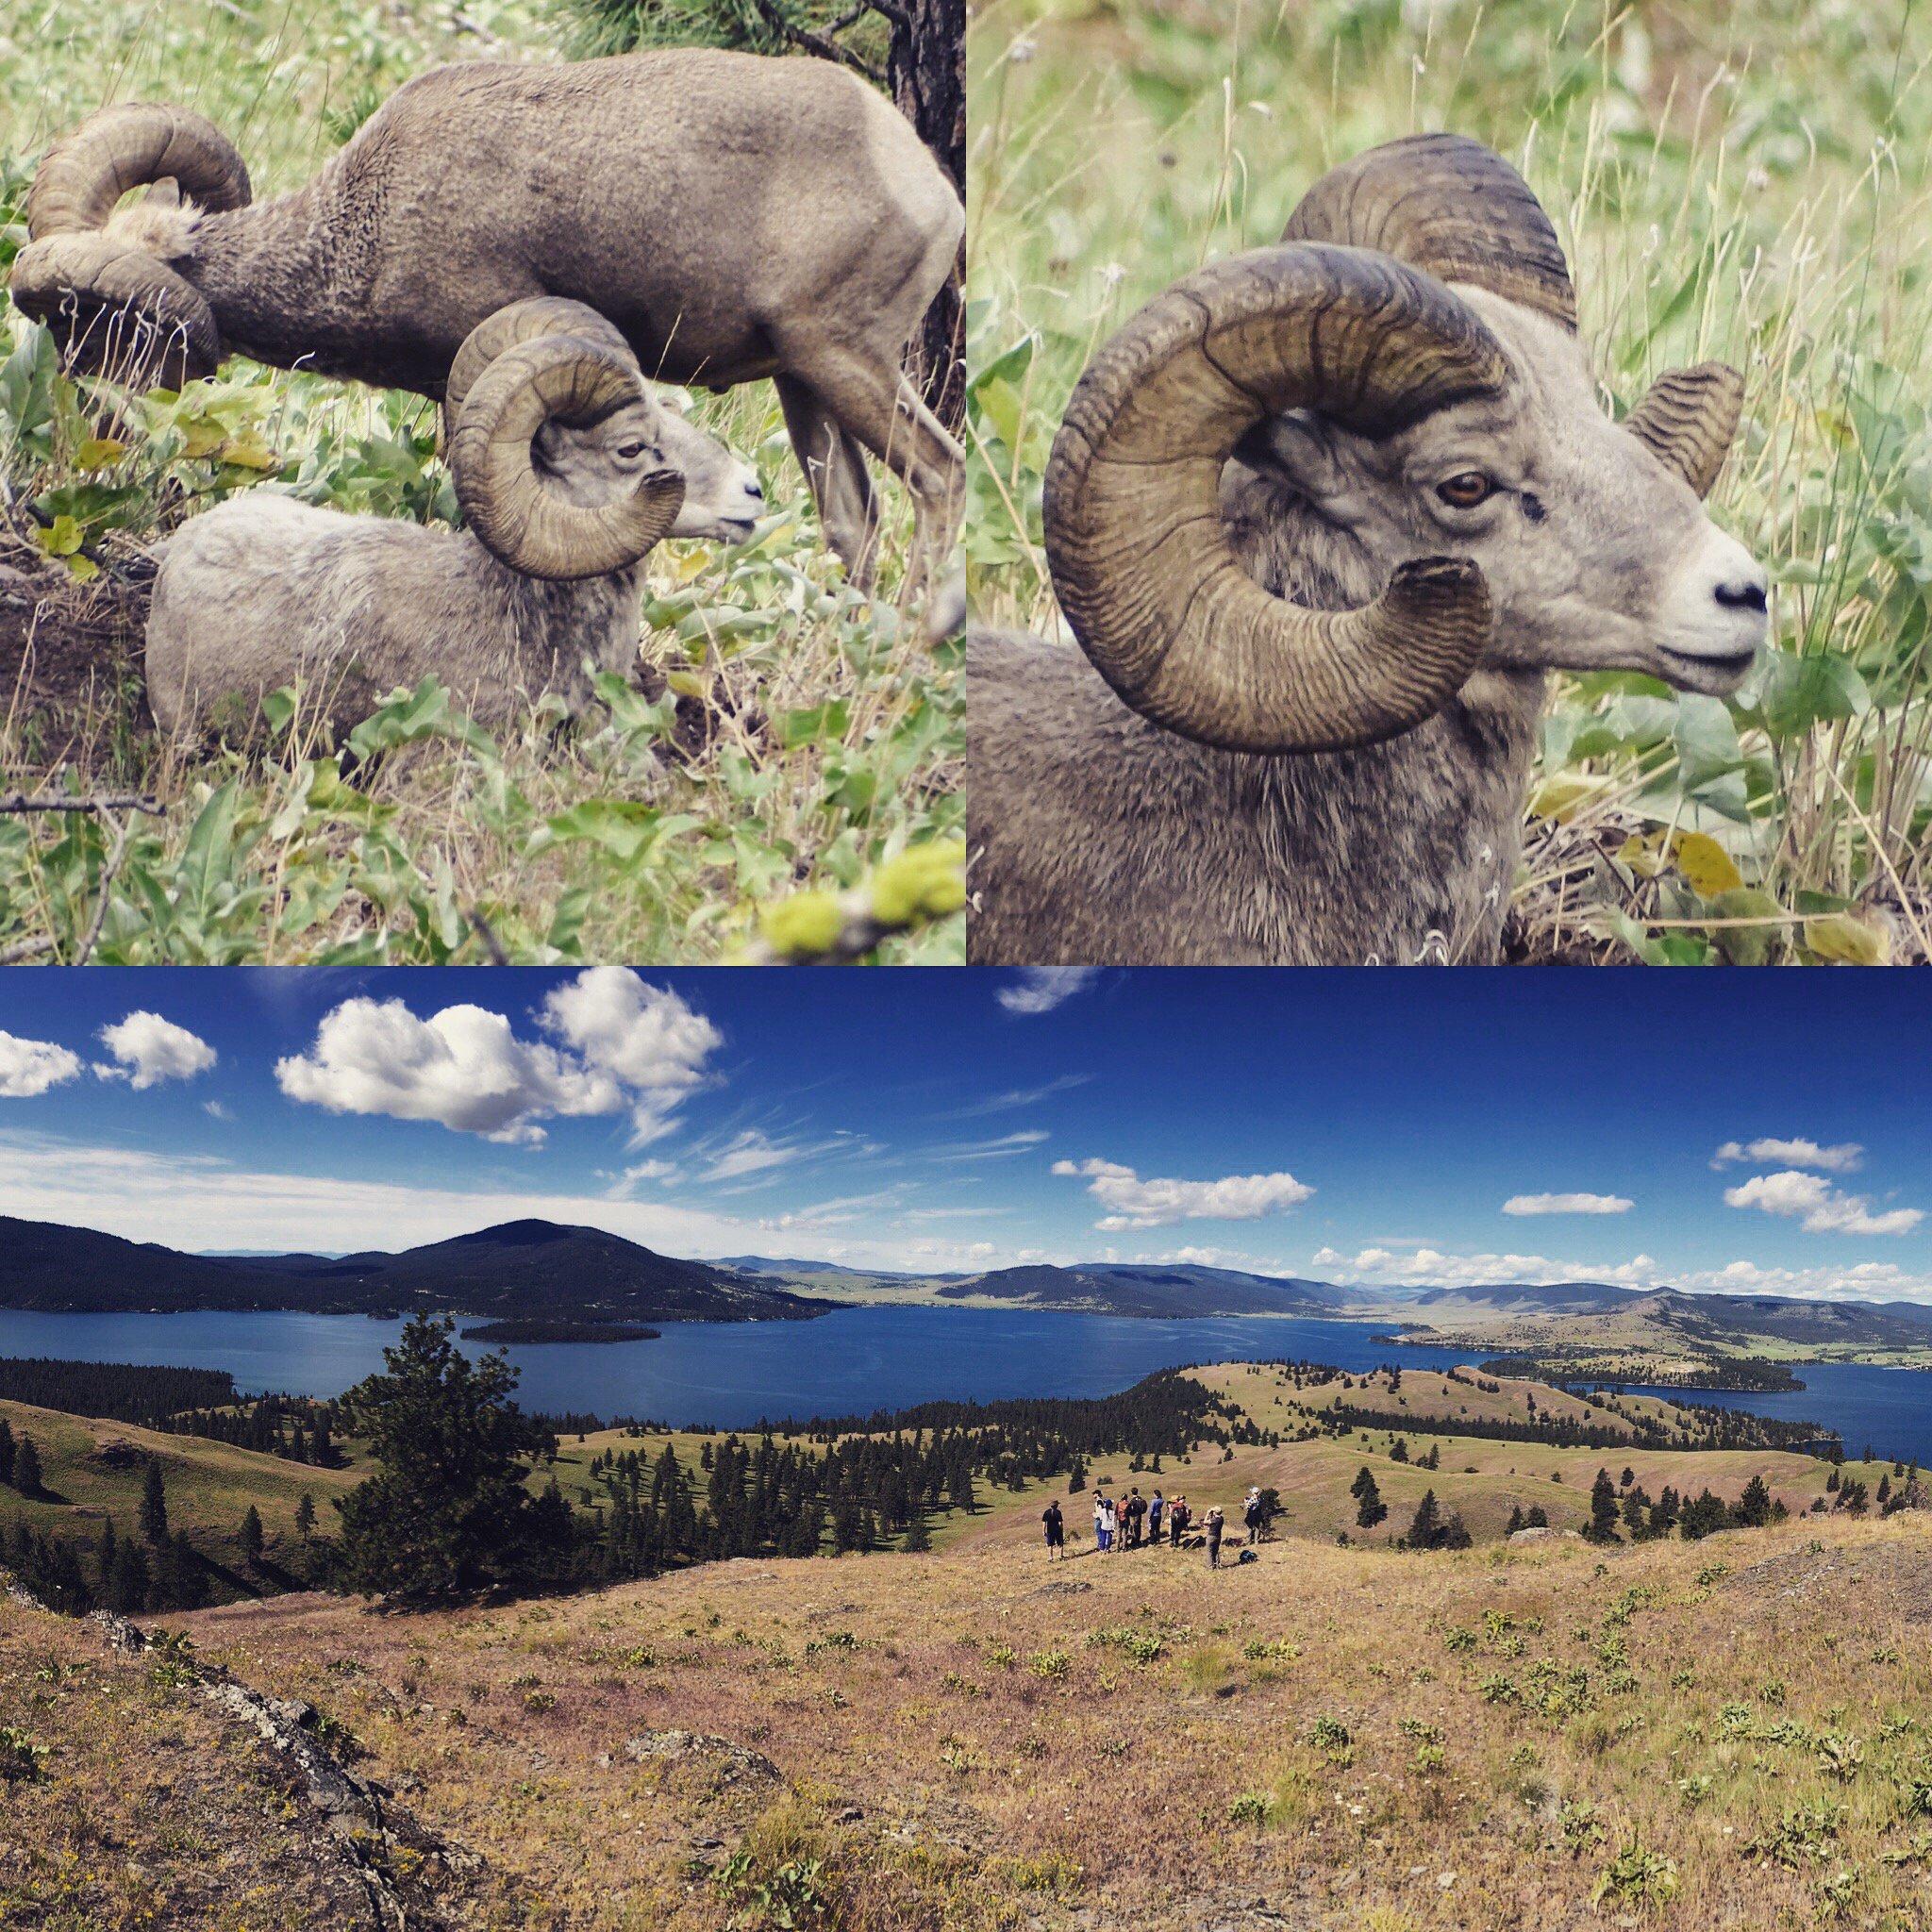 @umontana @FLBSUM A nice set of bighorn sheep! https://t.co/KzUriQzjH2